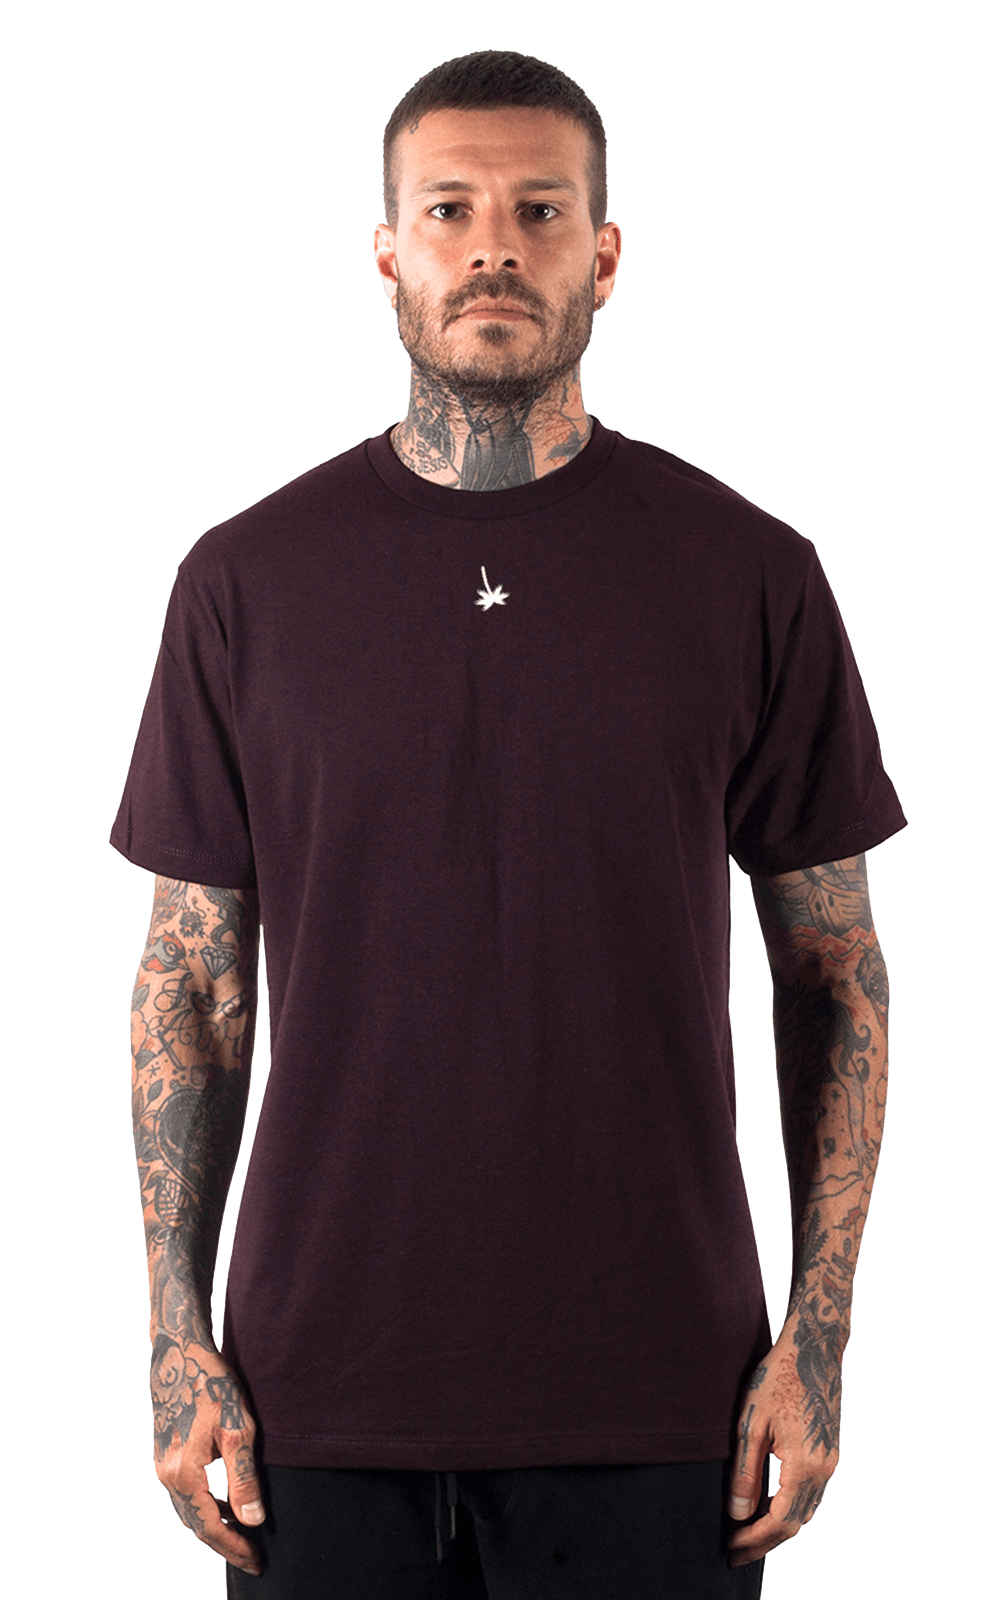 Camiseta_Hollywoodogz_SangriaHTR_Frente